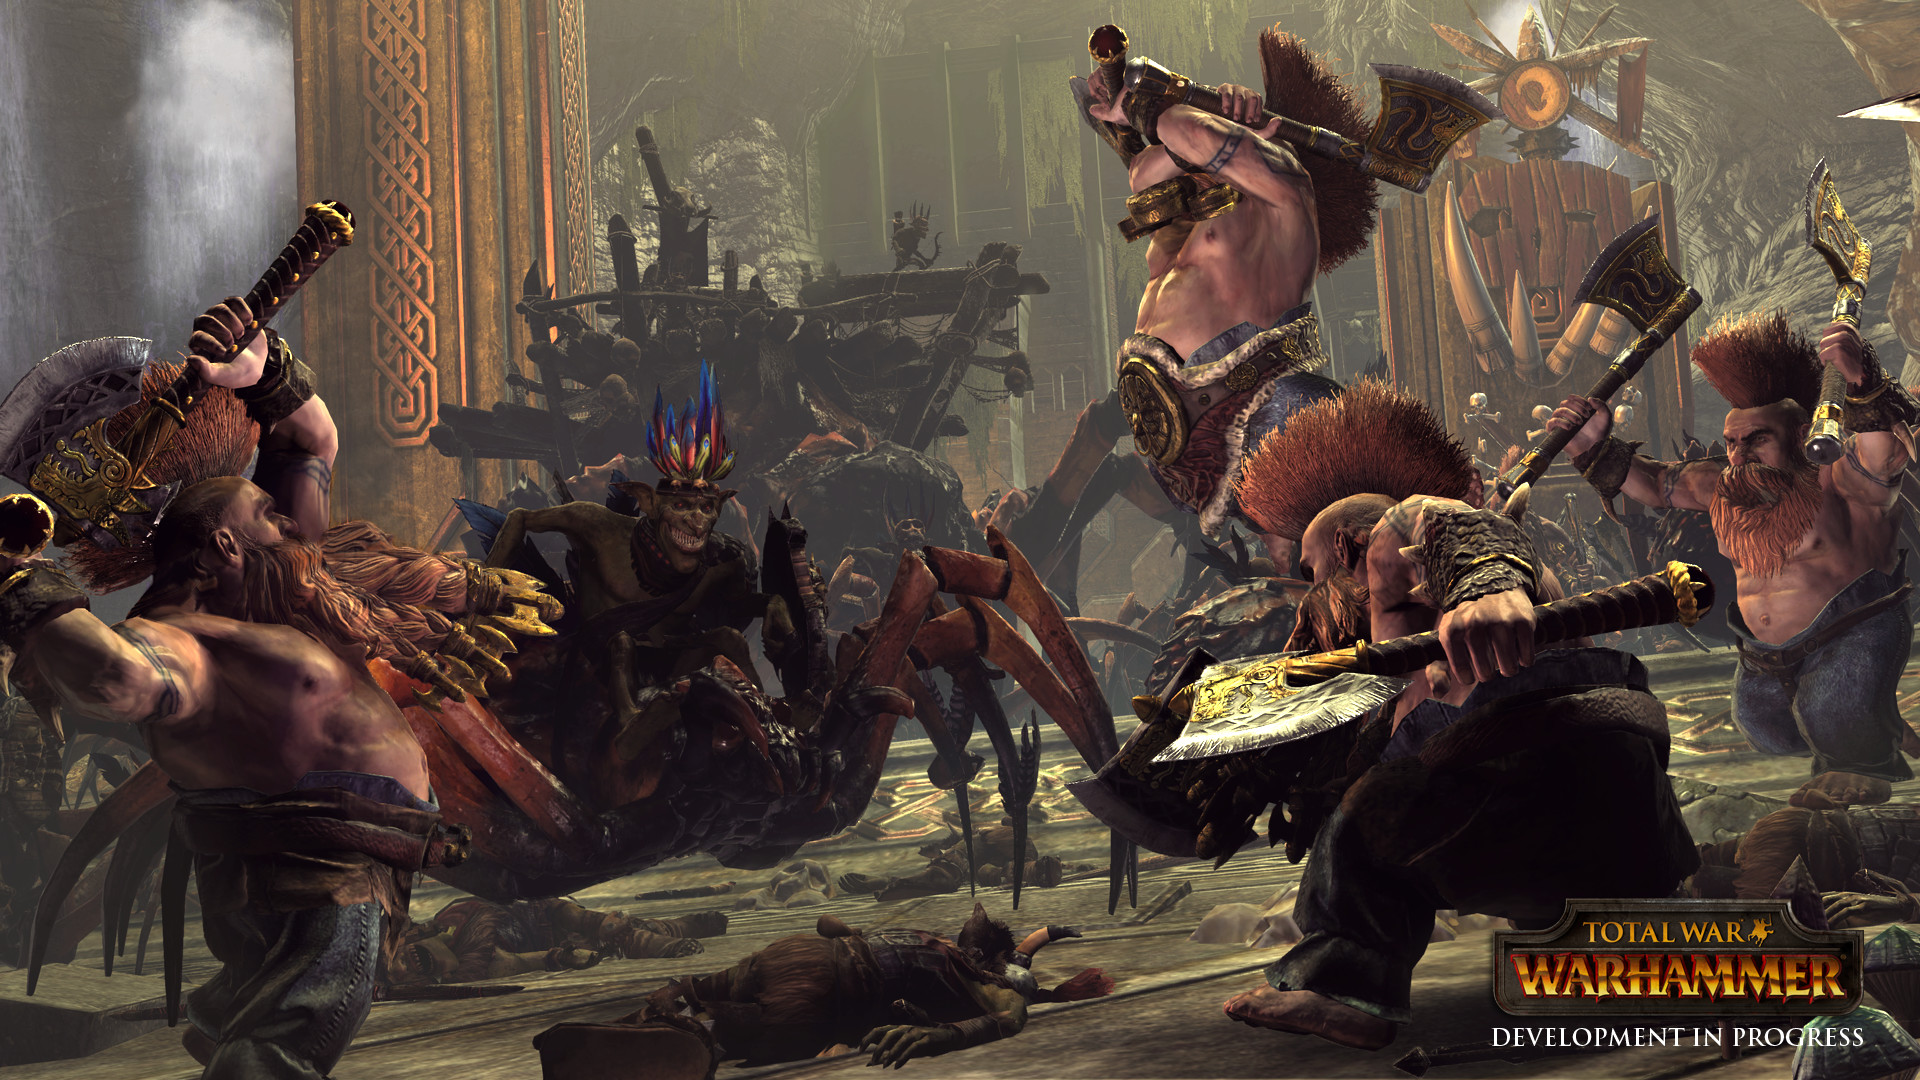 Total War Warhammer HD Wallpaper   Full HD Pictures